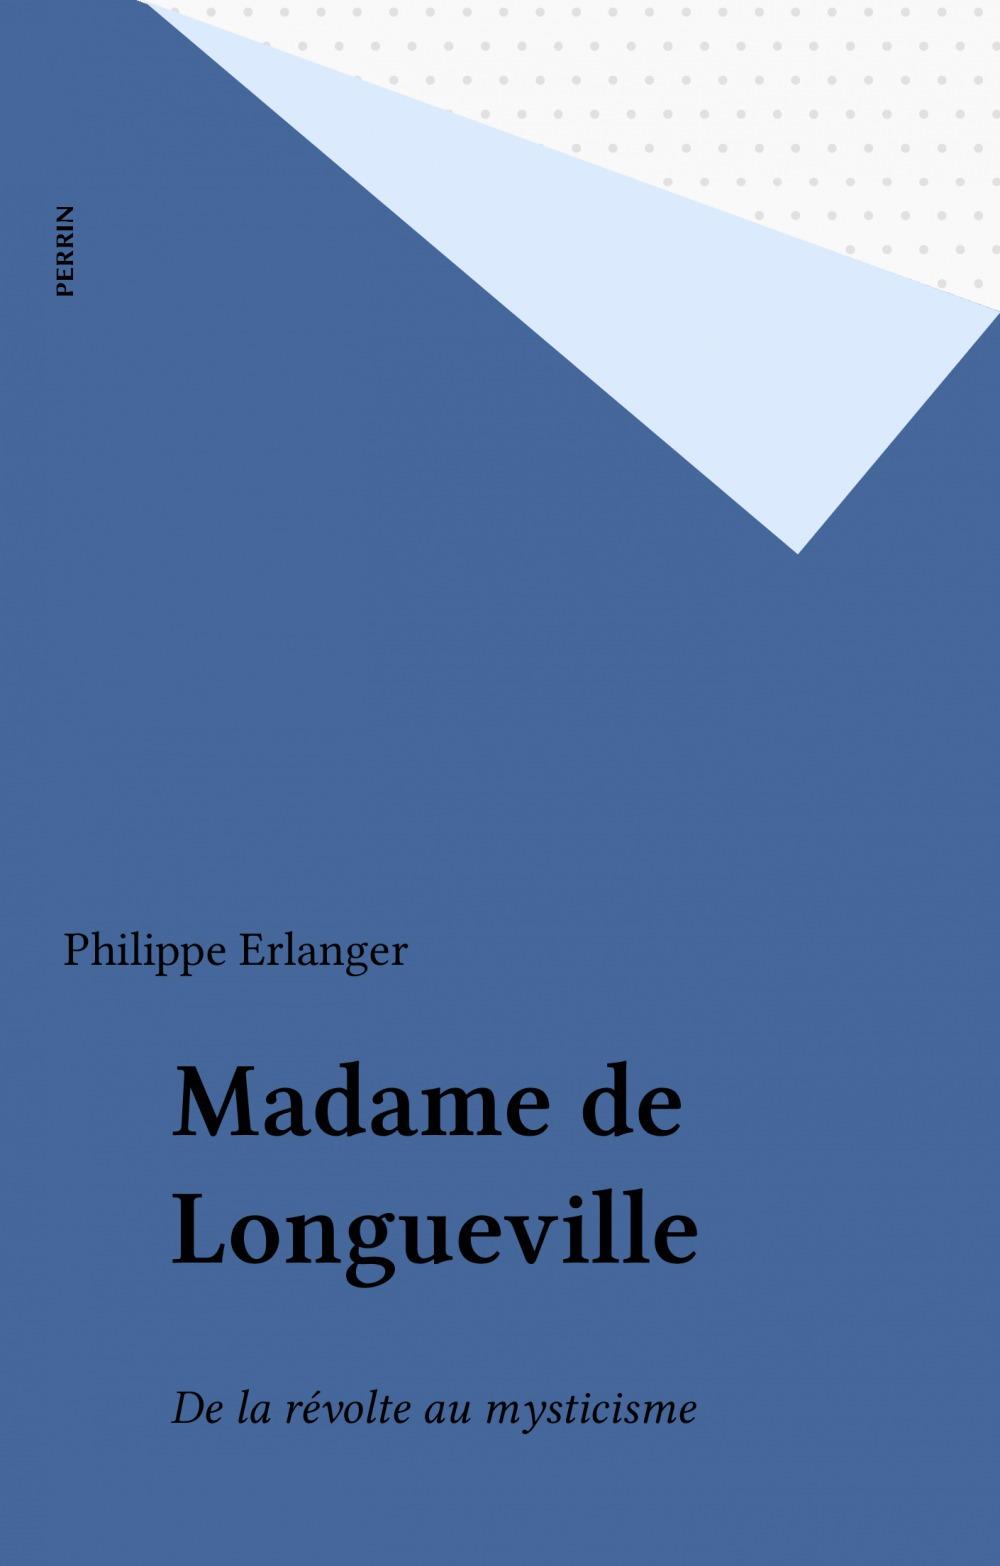 Madame de longueville ski